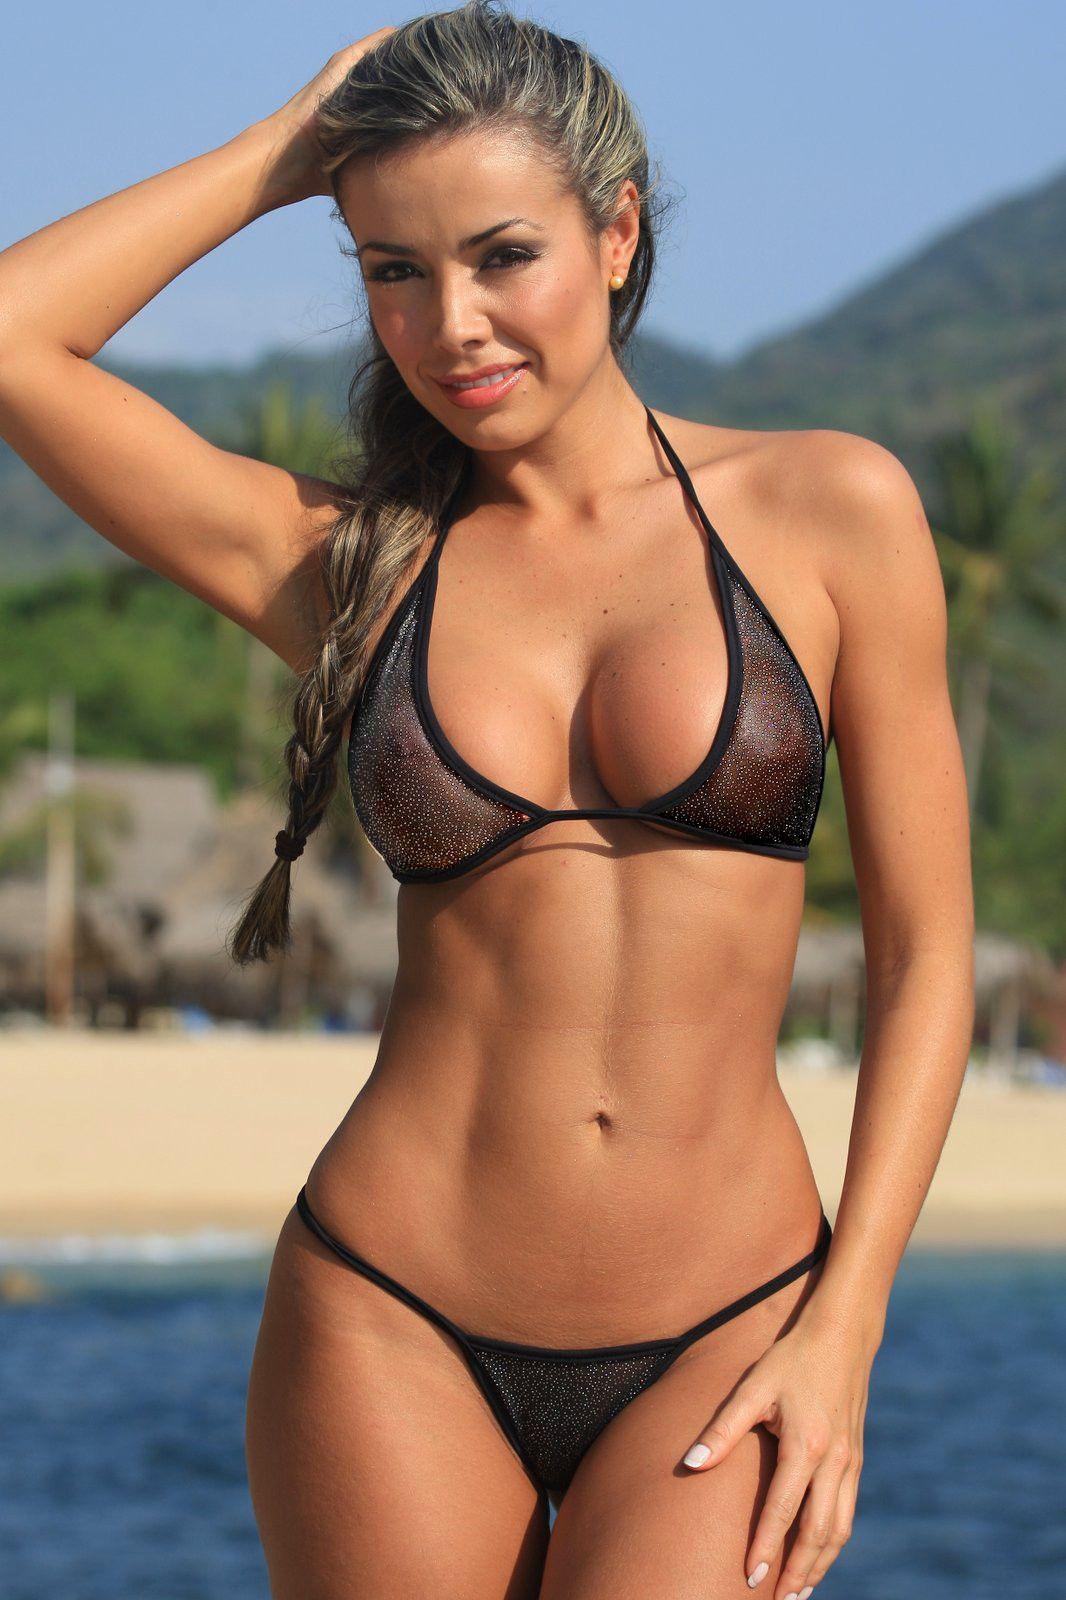 Bikini Mom see through